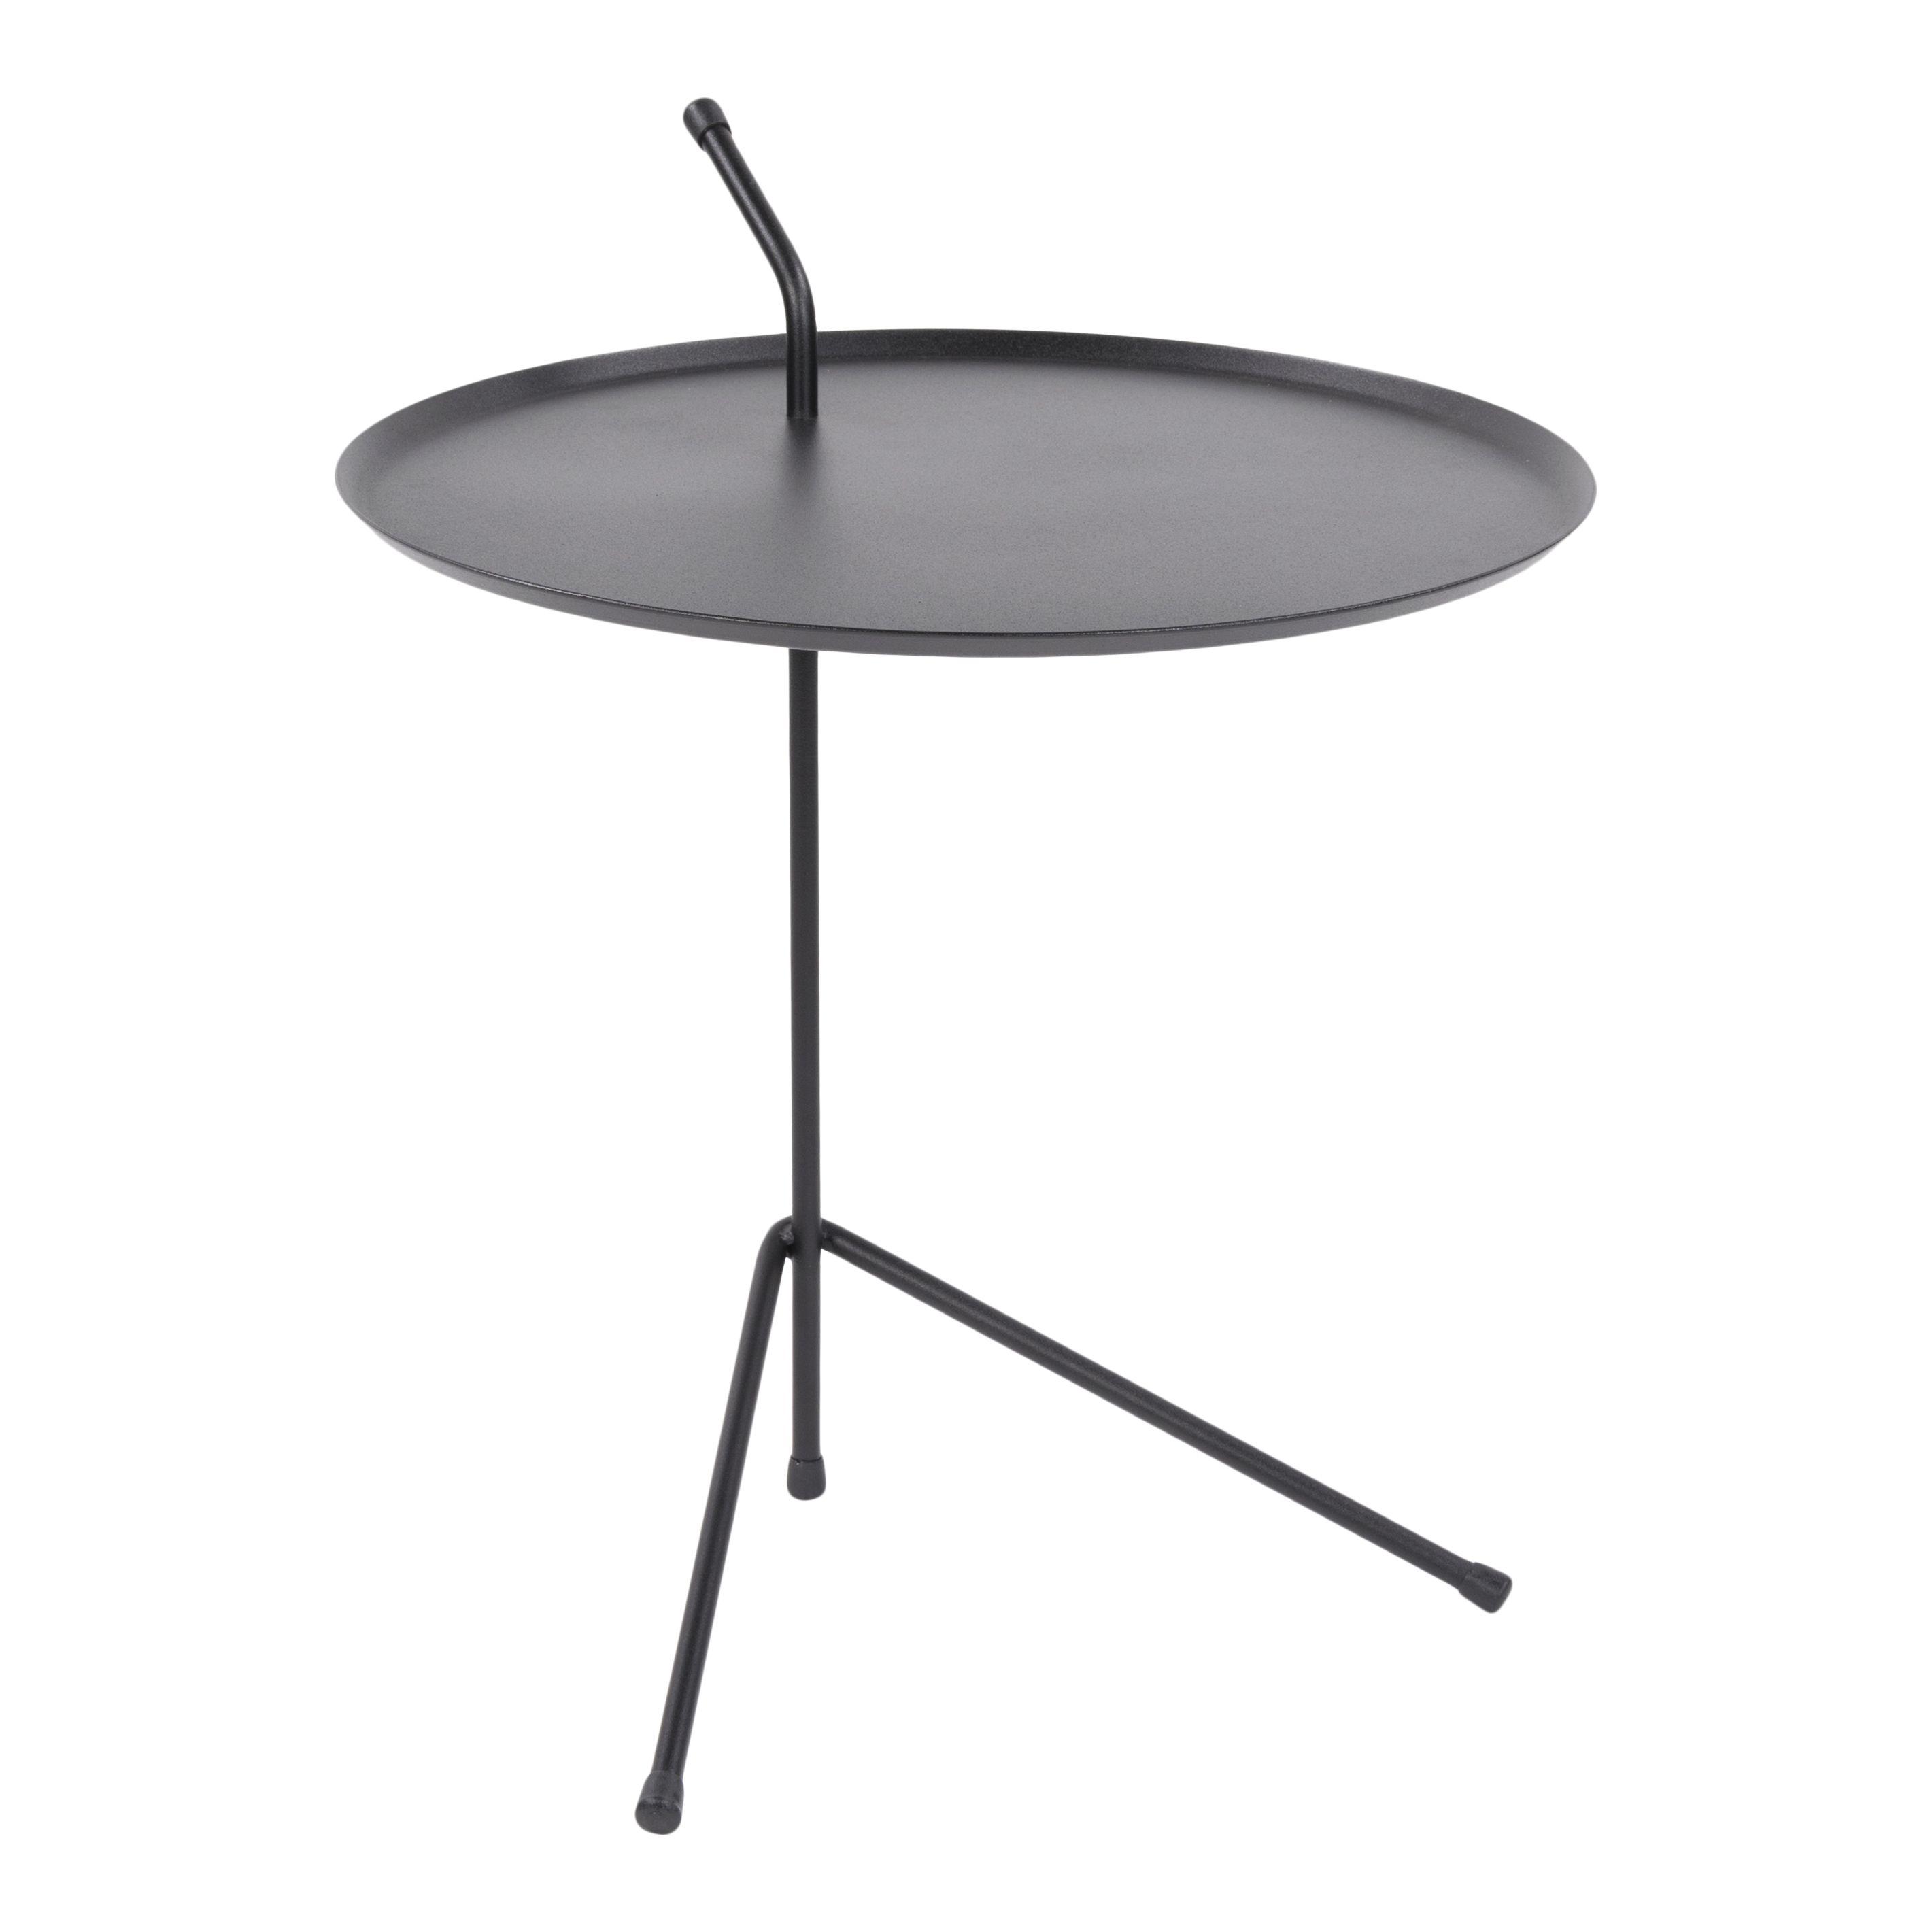 Merlin 40 50 Side Table Ebern Designs Small Coffee Table [ 2841 x 2841 Pixel ]